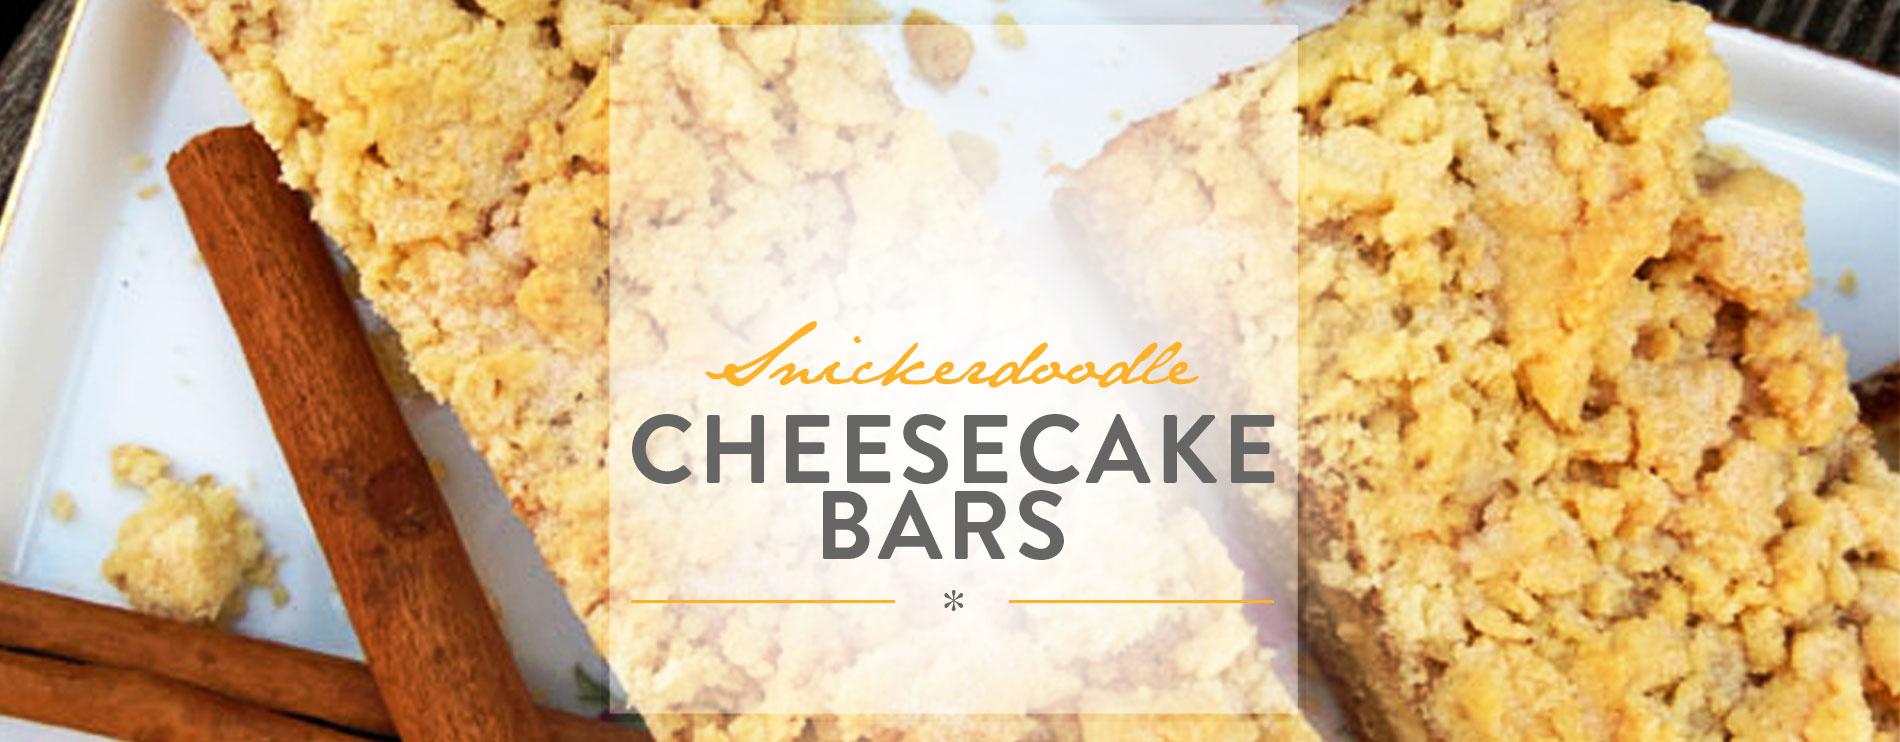 Header Snickerdoodle Cheesecake Bars